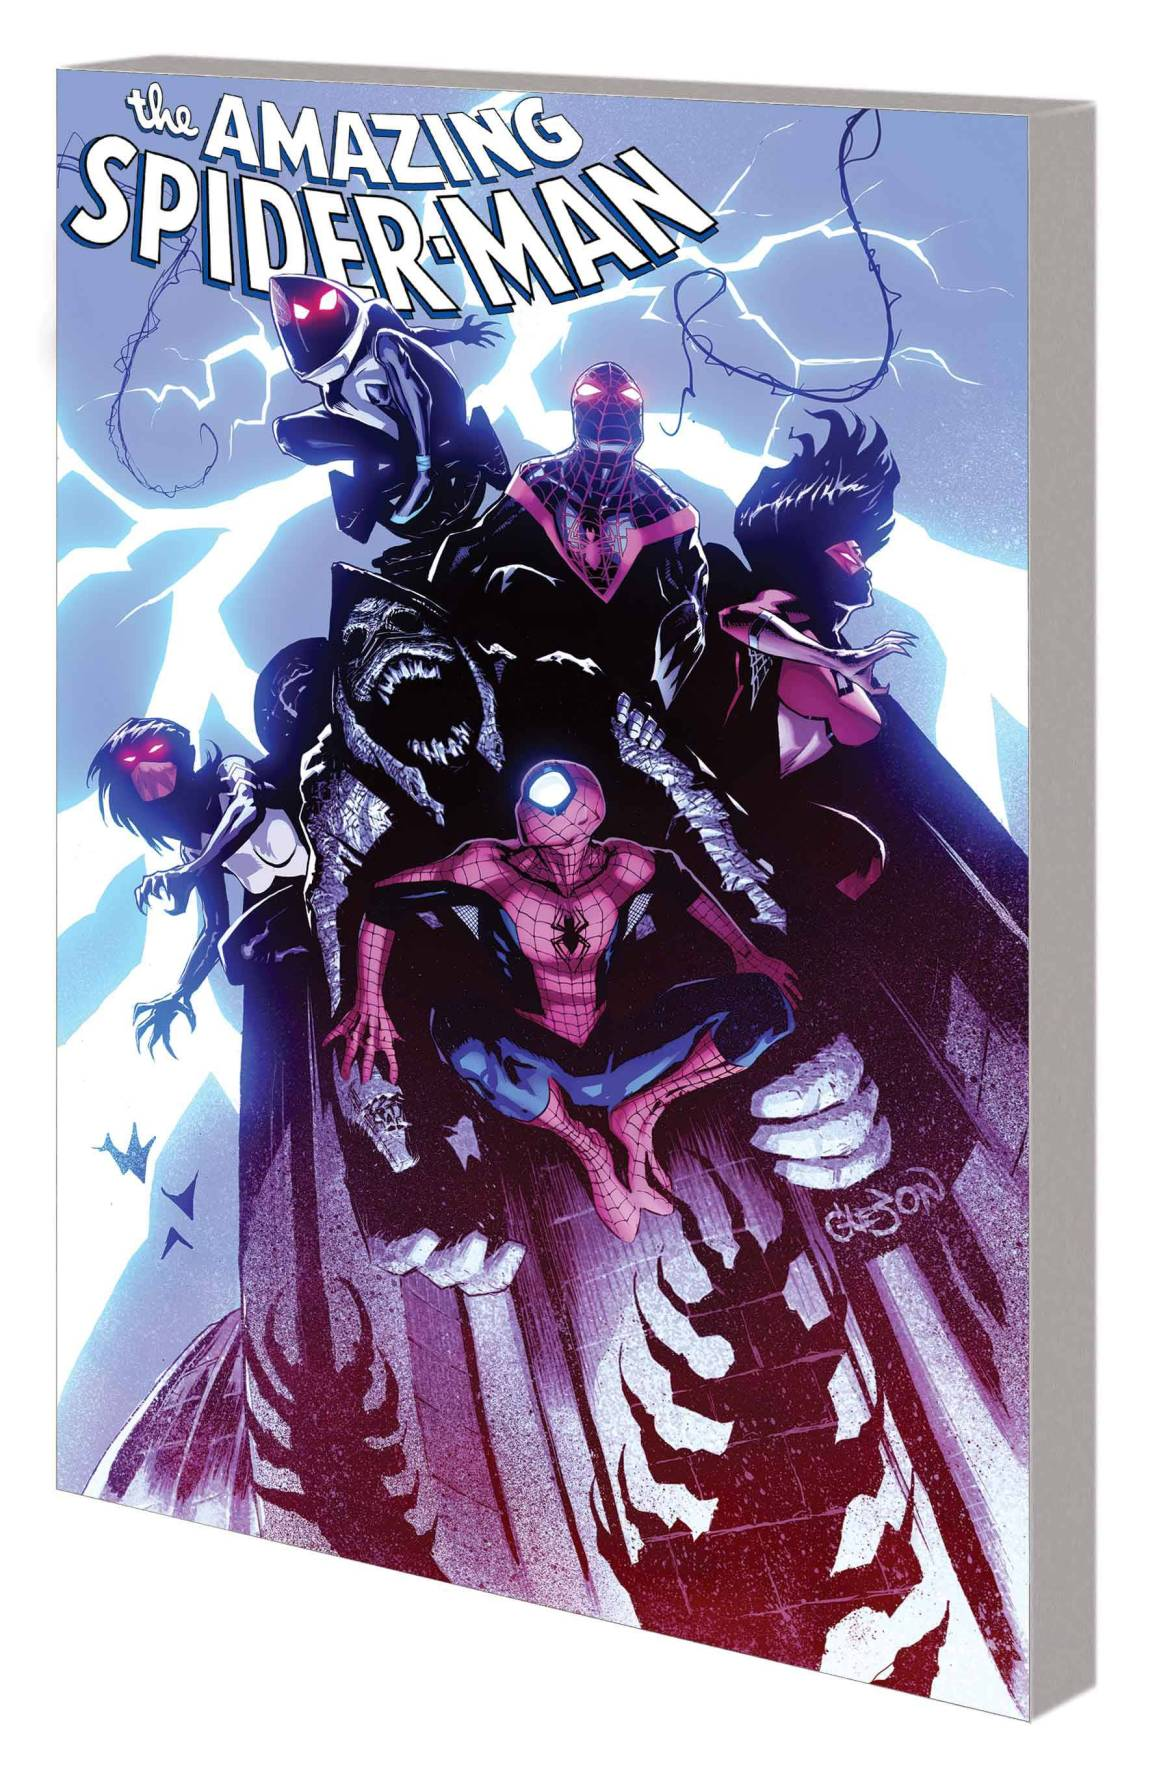 STL177181 Marvel Comics Extended Forecast for 01/13/2021